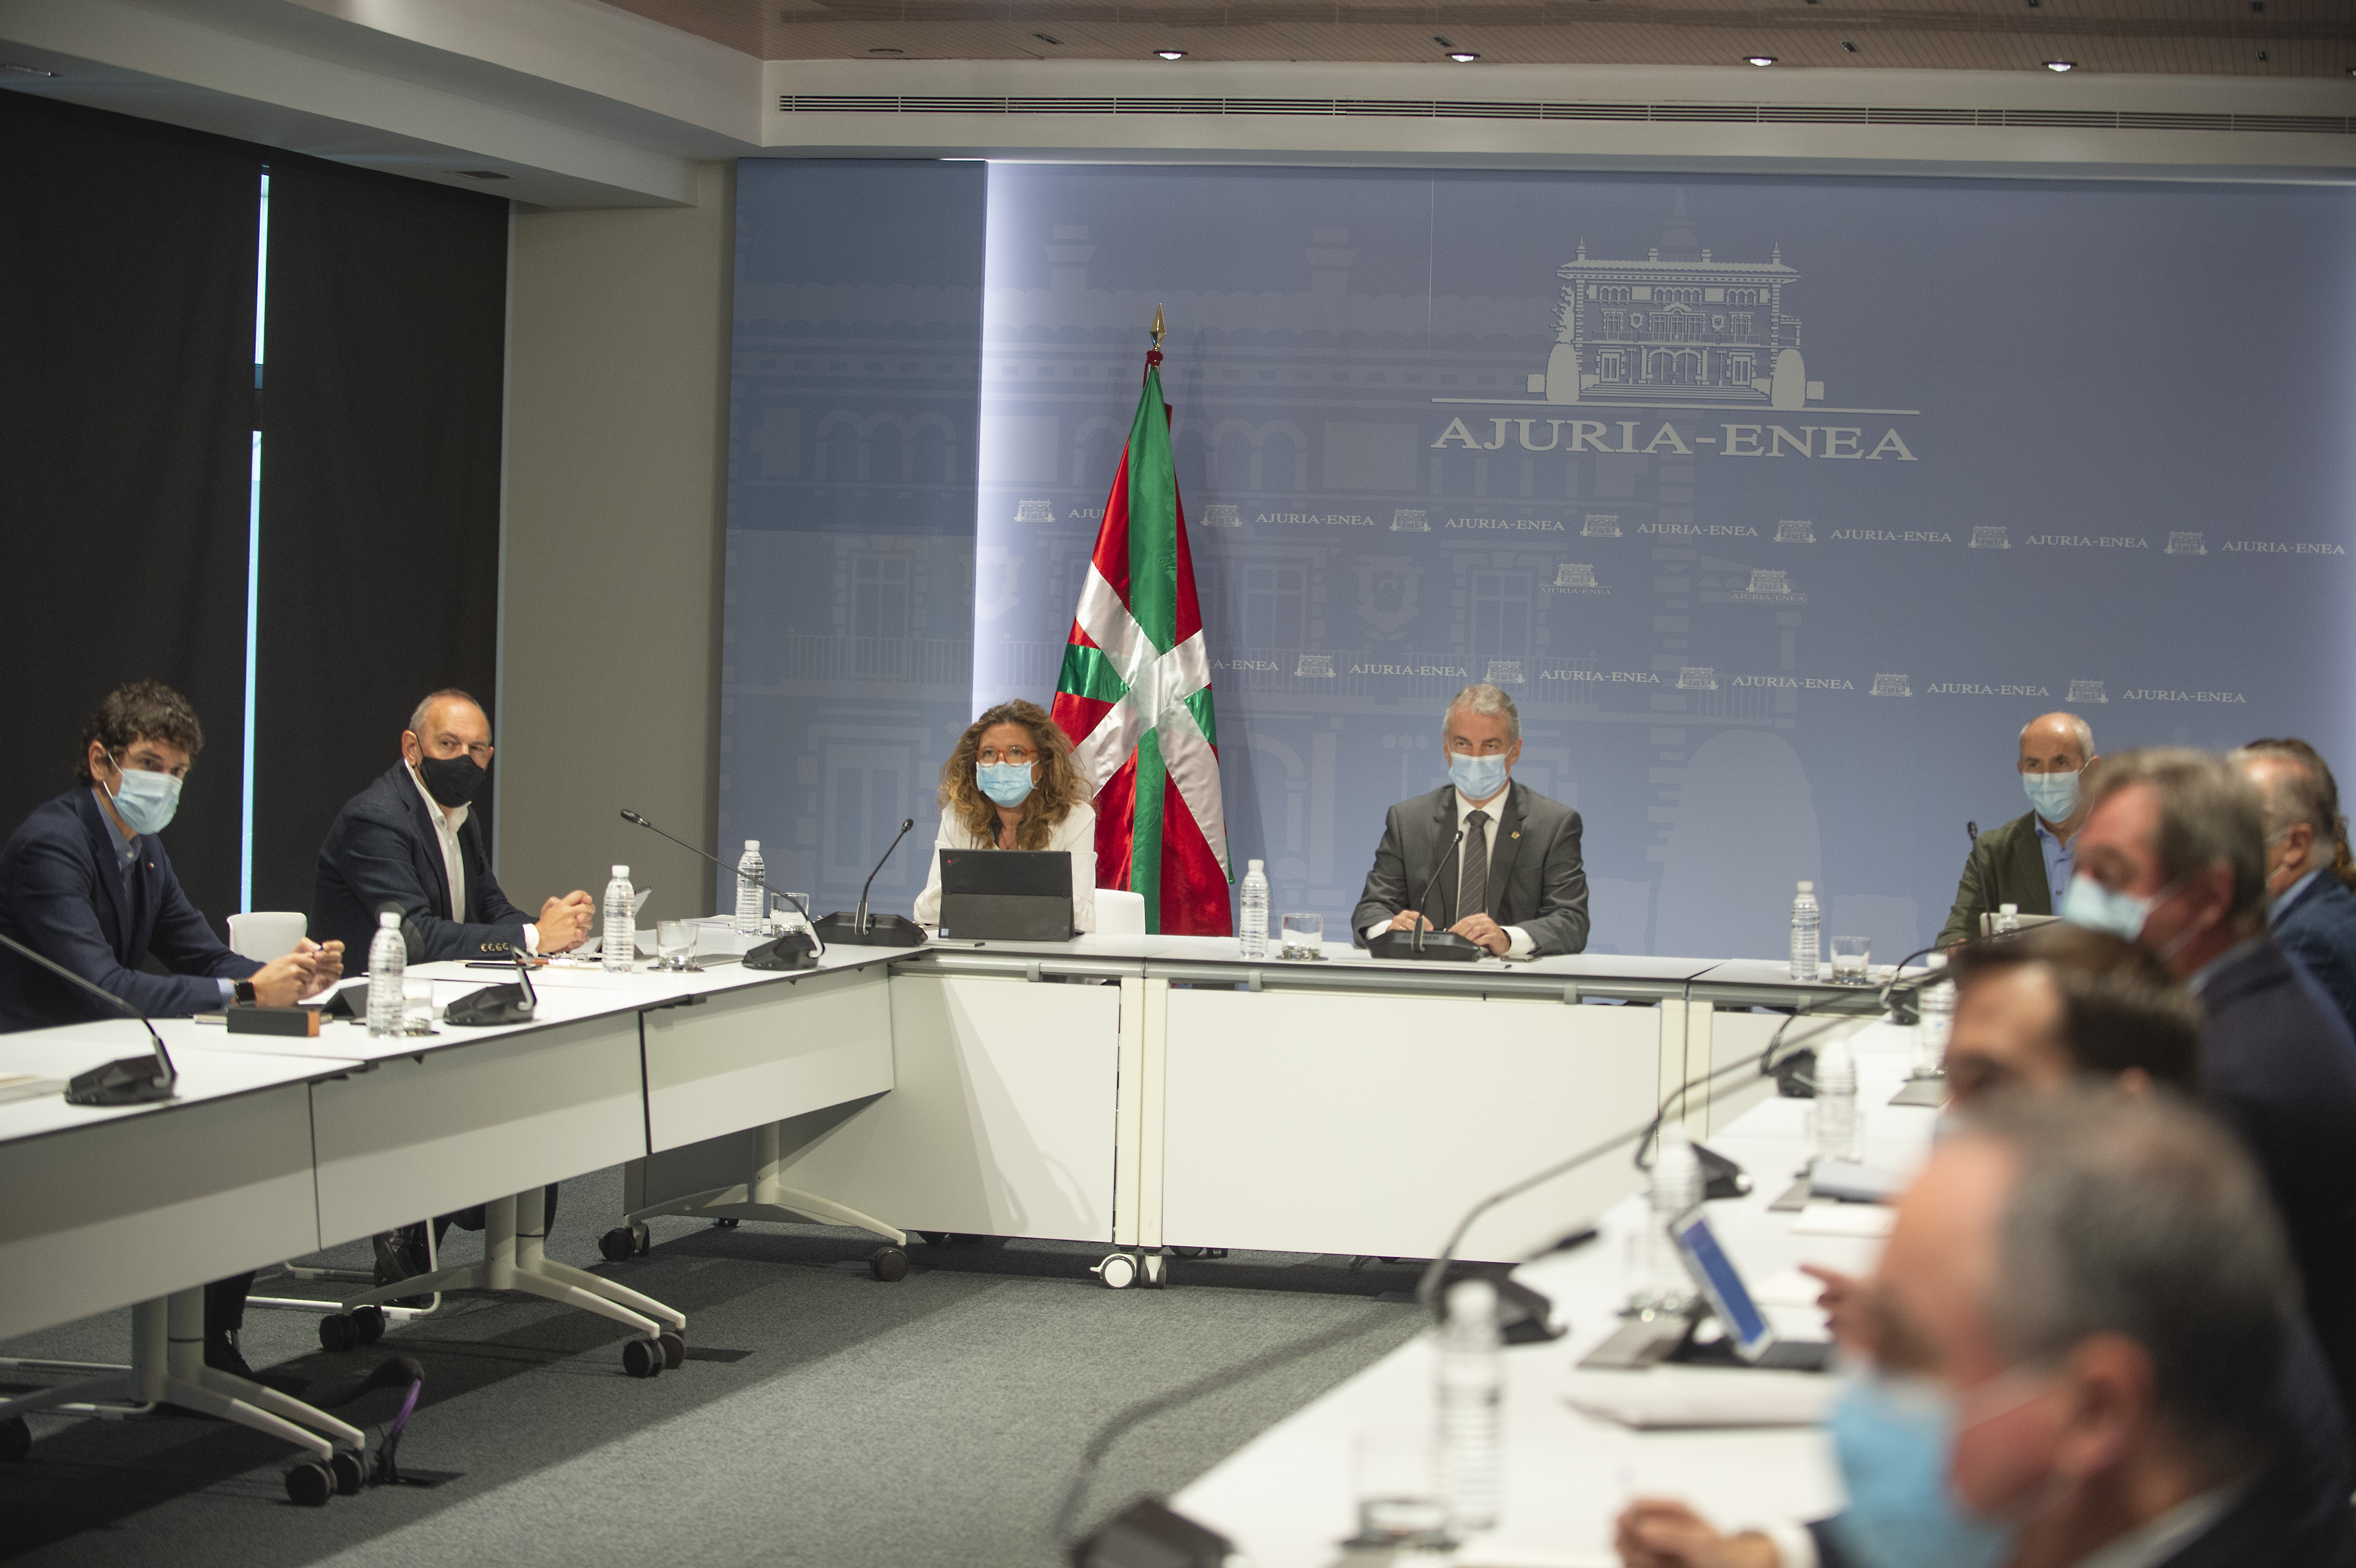 El Lehendakari preside la reunión del  Comité Asesor del LABI [0:00]